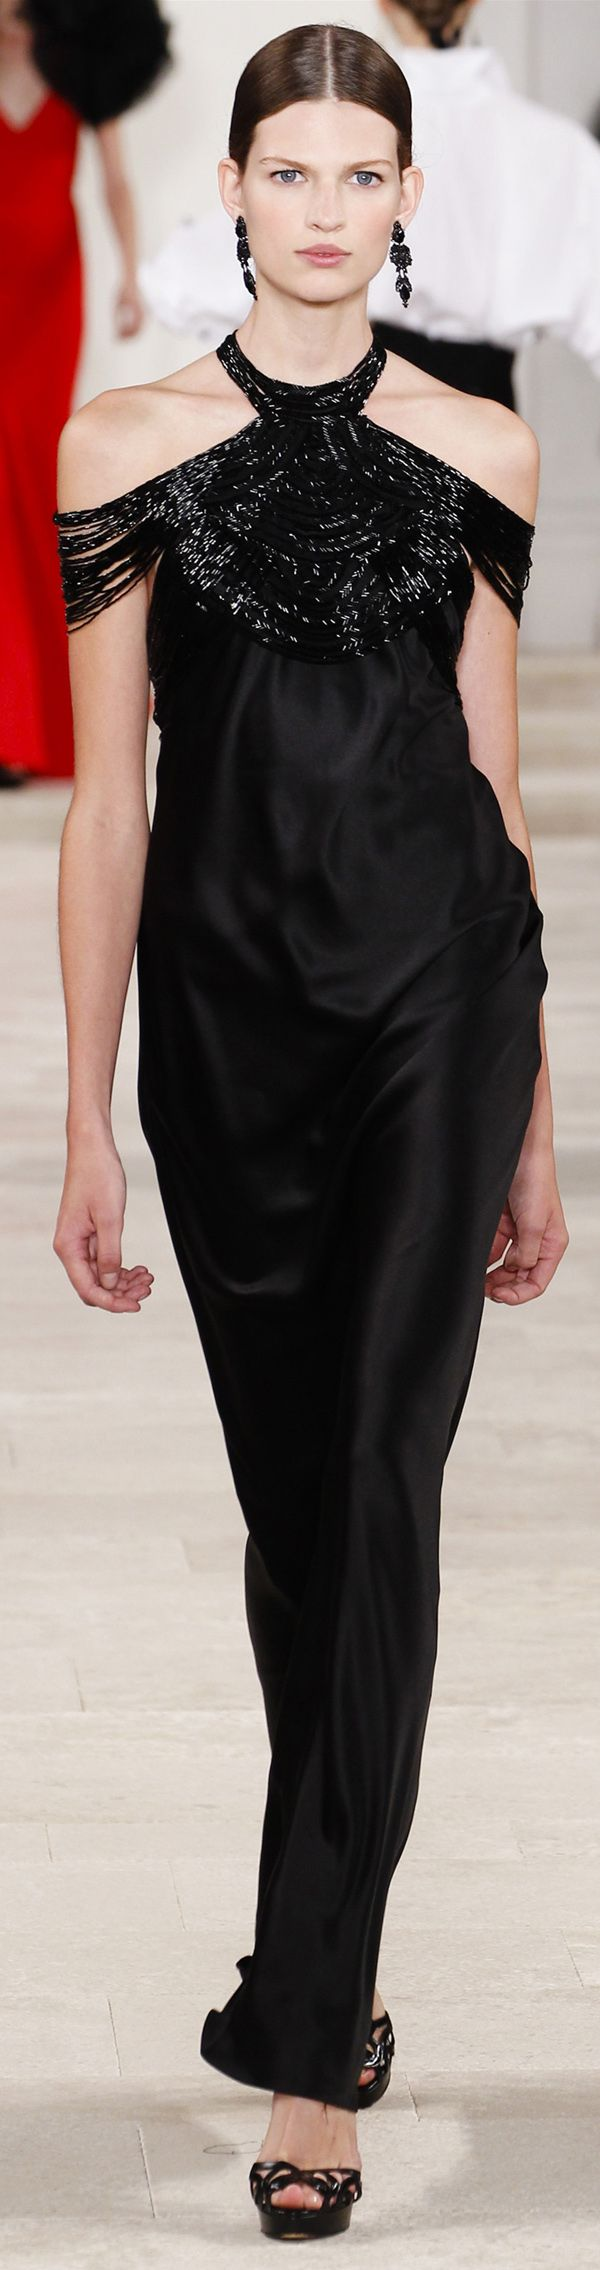 Ralph Lauren Spring Summer 2013 Designer Evening Gowns